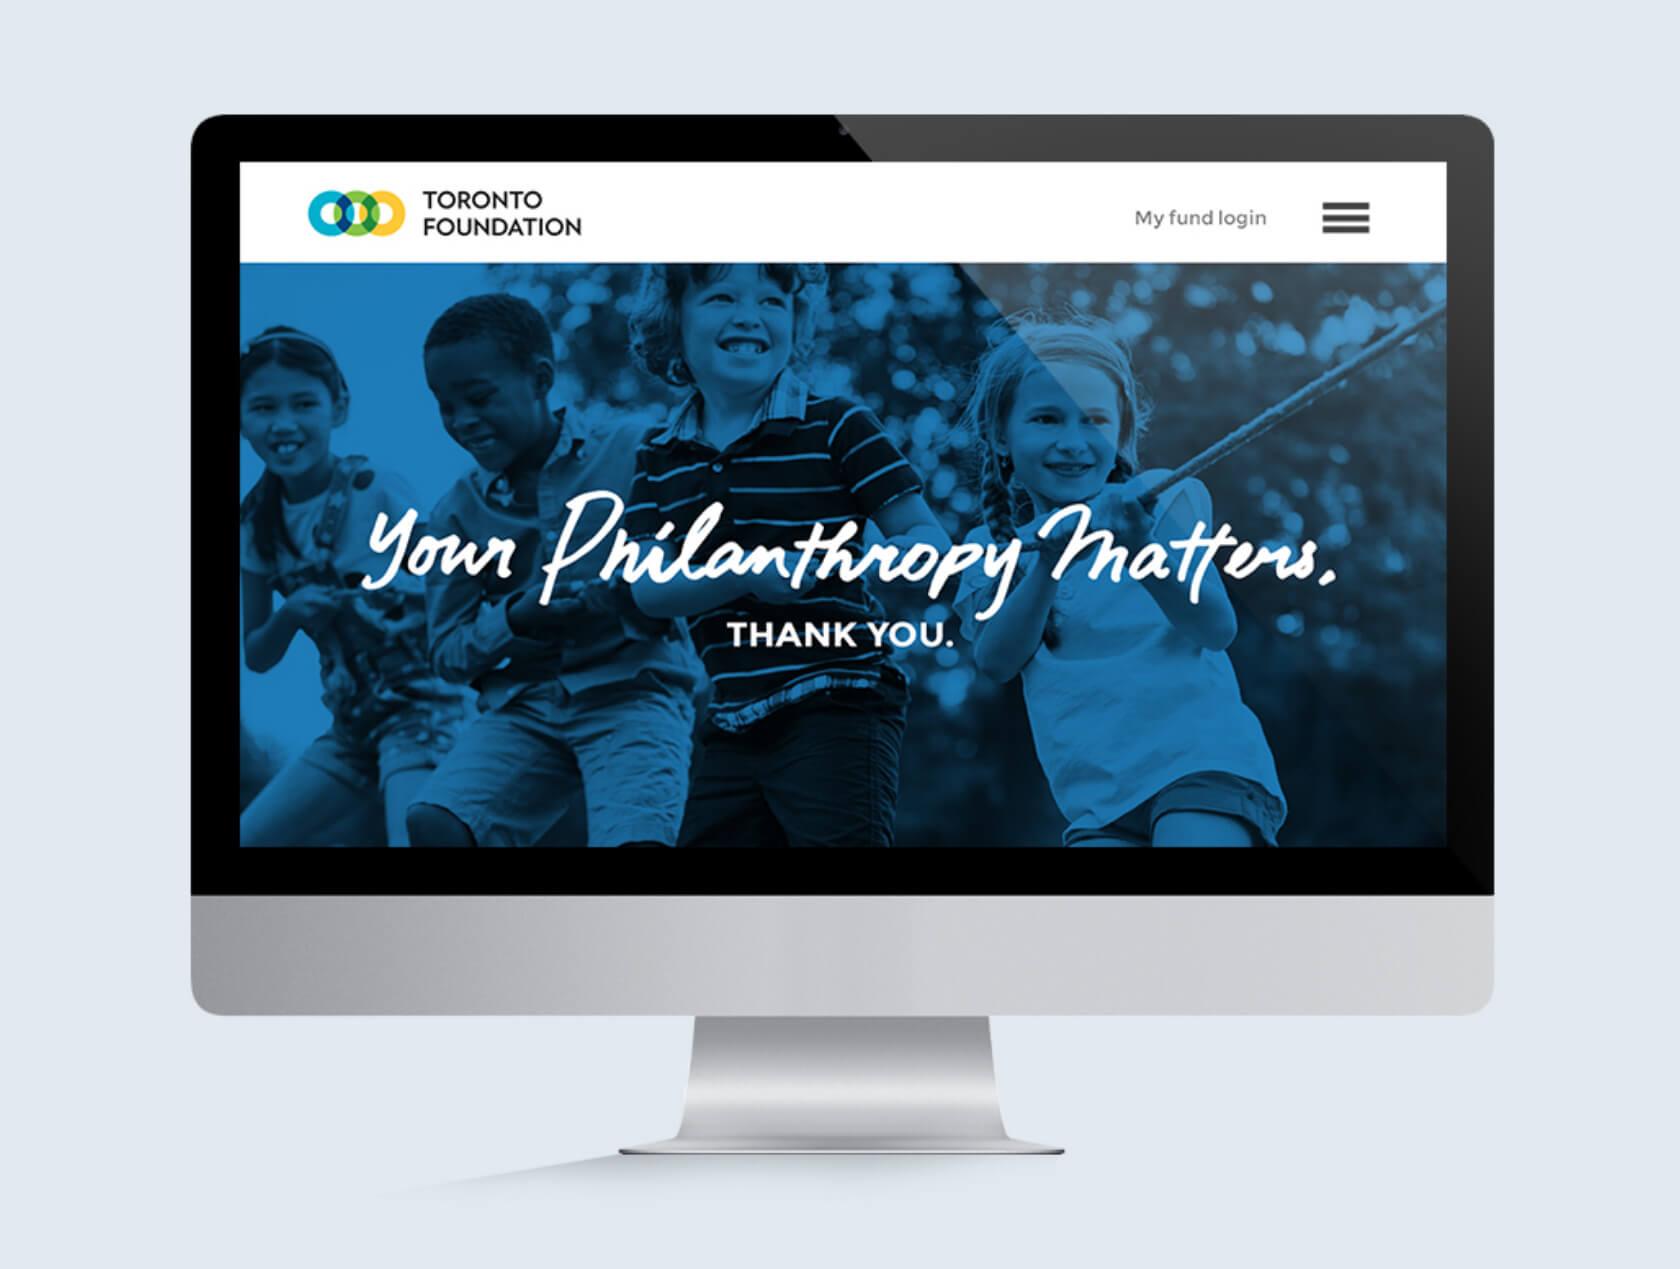 Desktop computer with Toronto Foundation's website displayed